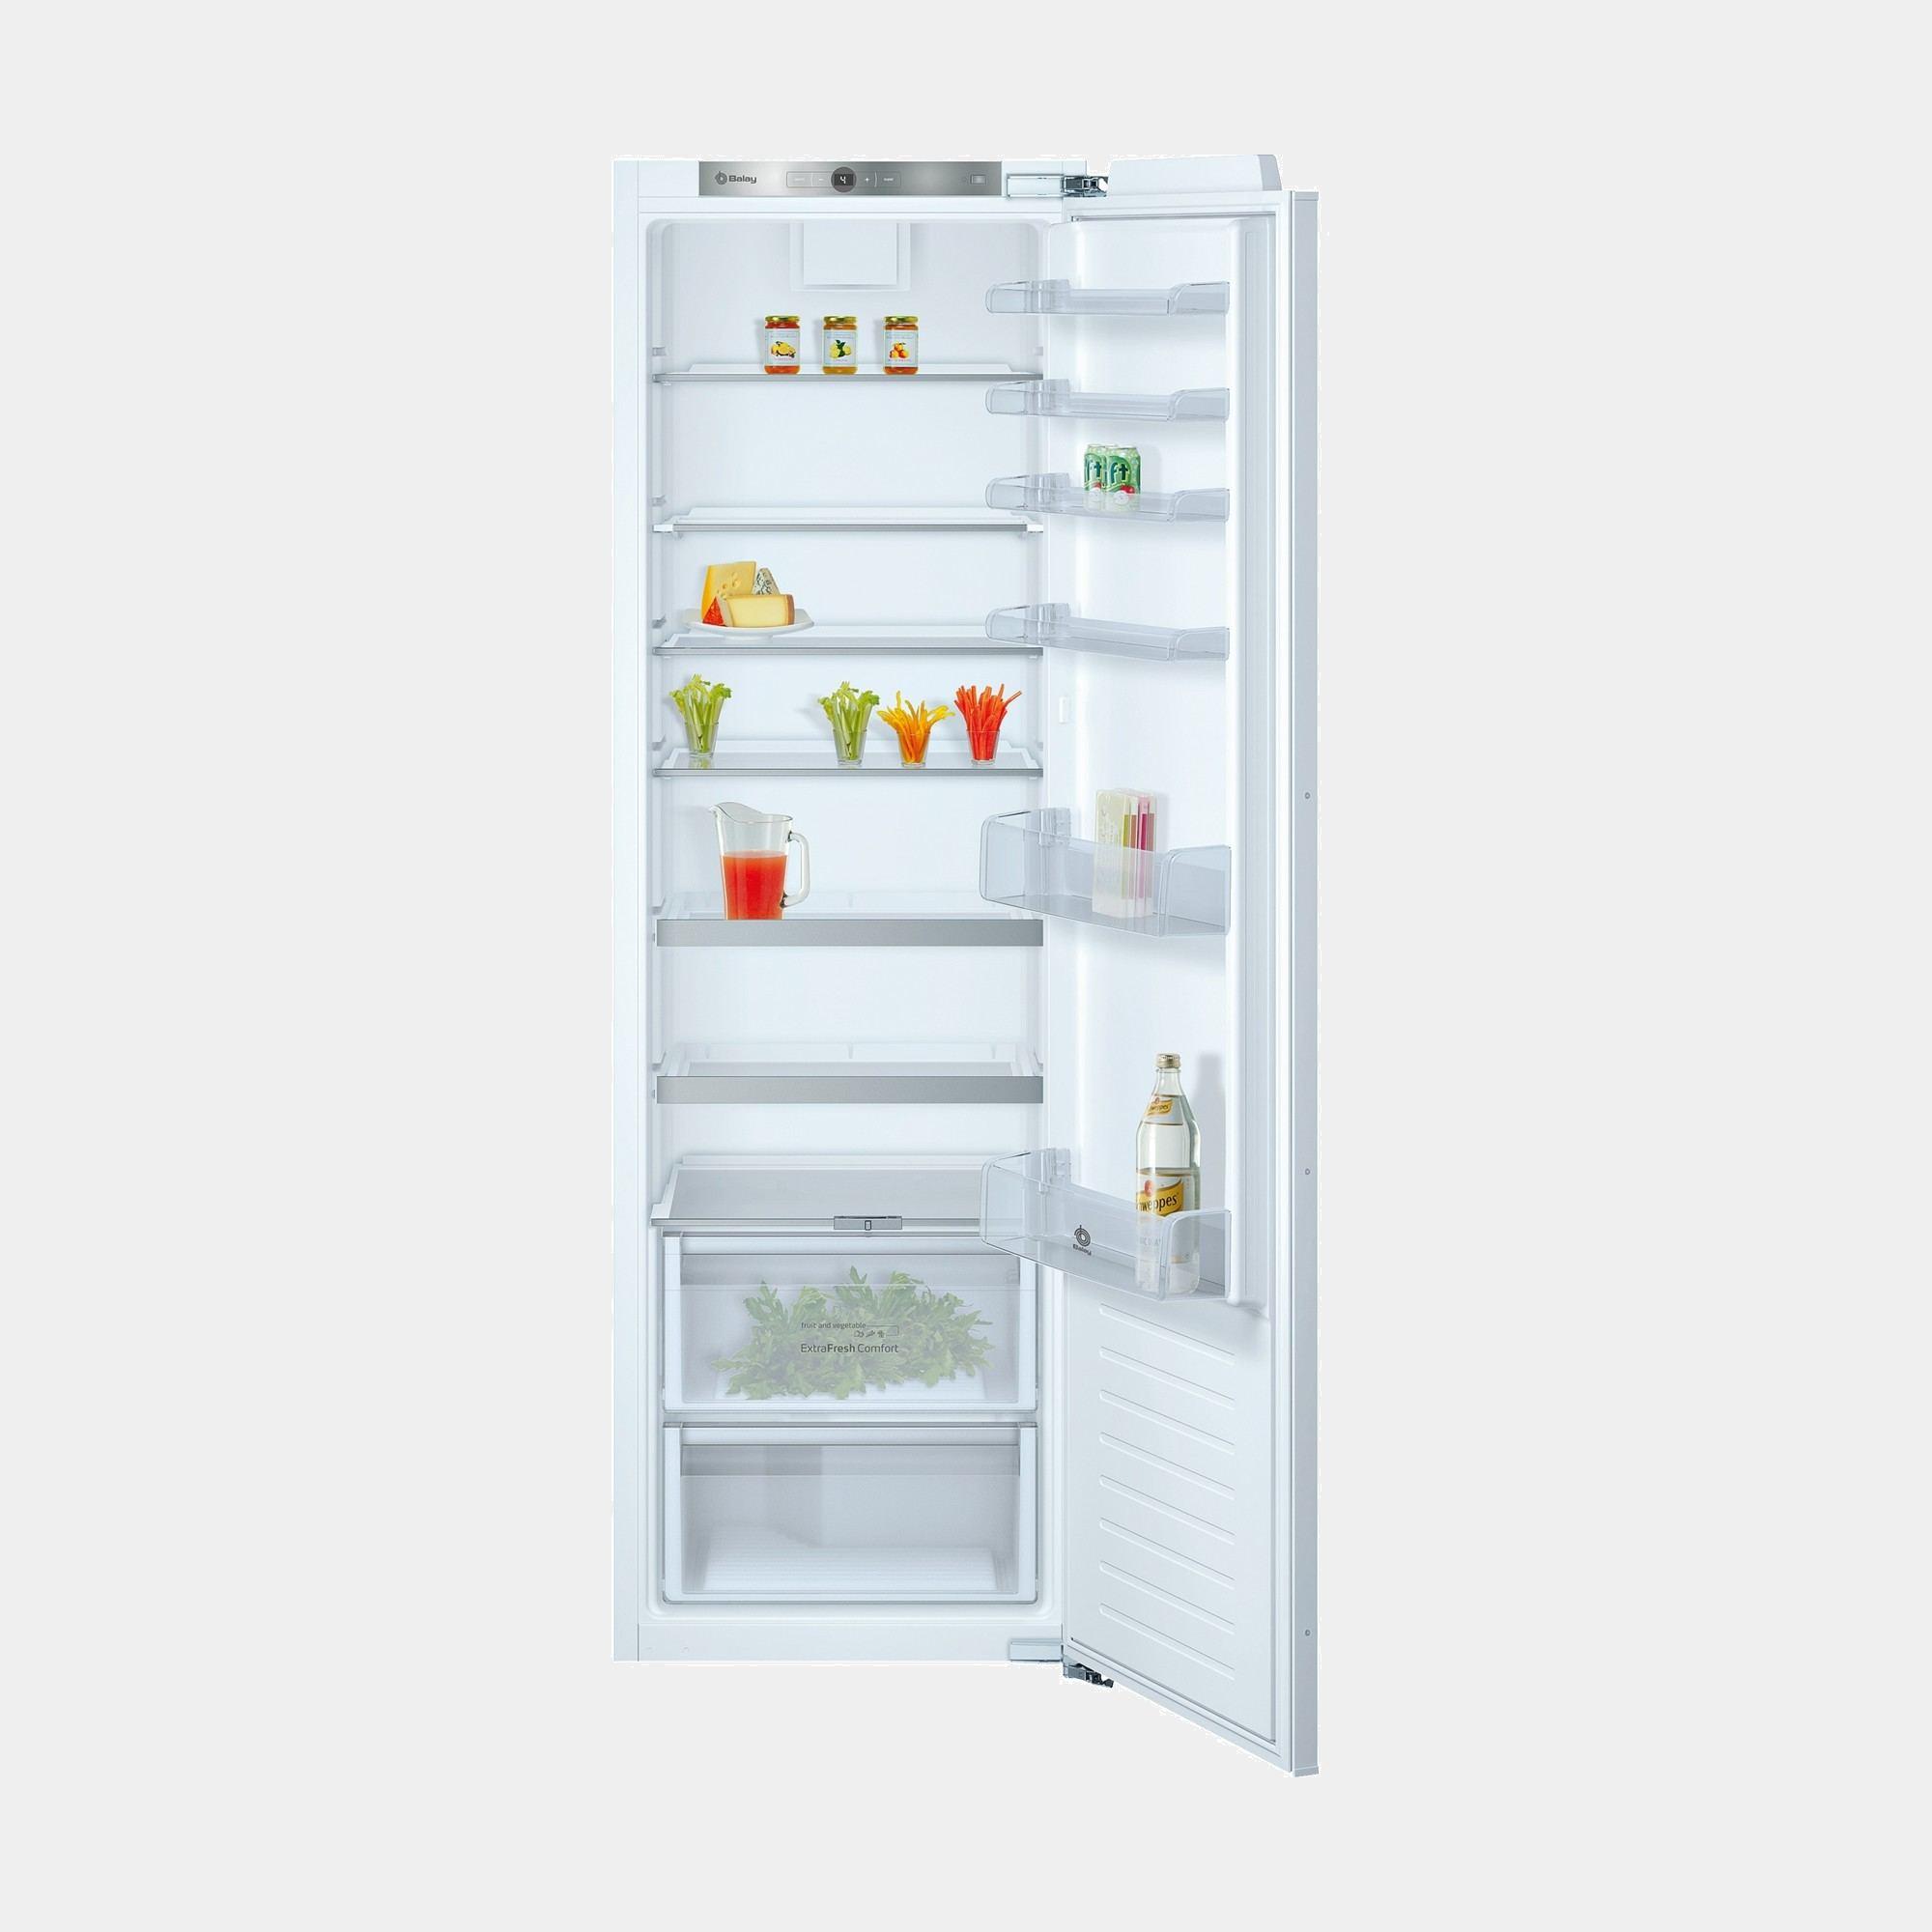 Artica affu185x frigorifico de 1 puerta inox 185x60 no - Frigorificos una puerta no frost ...